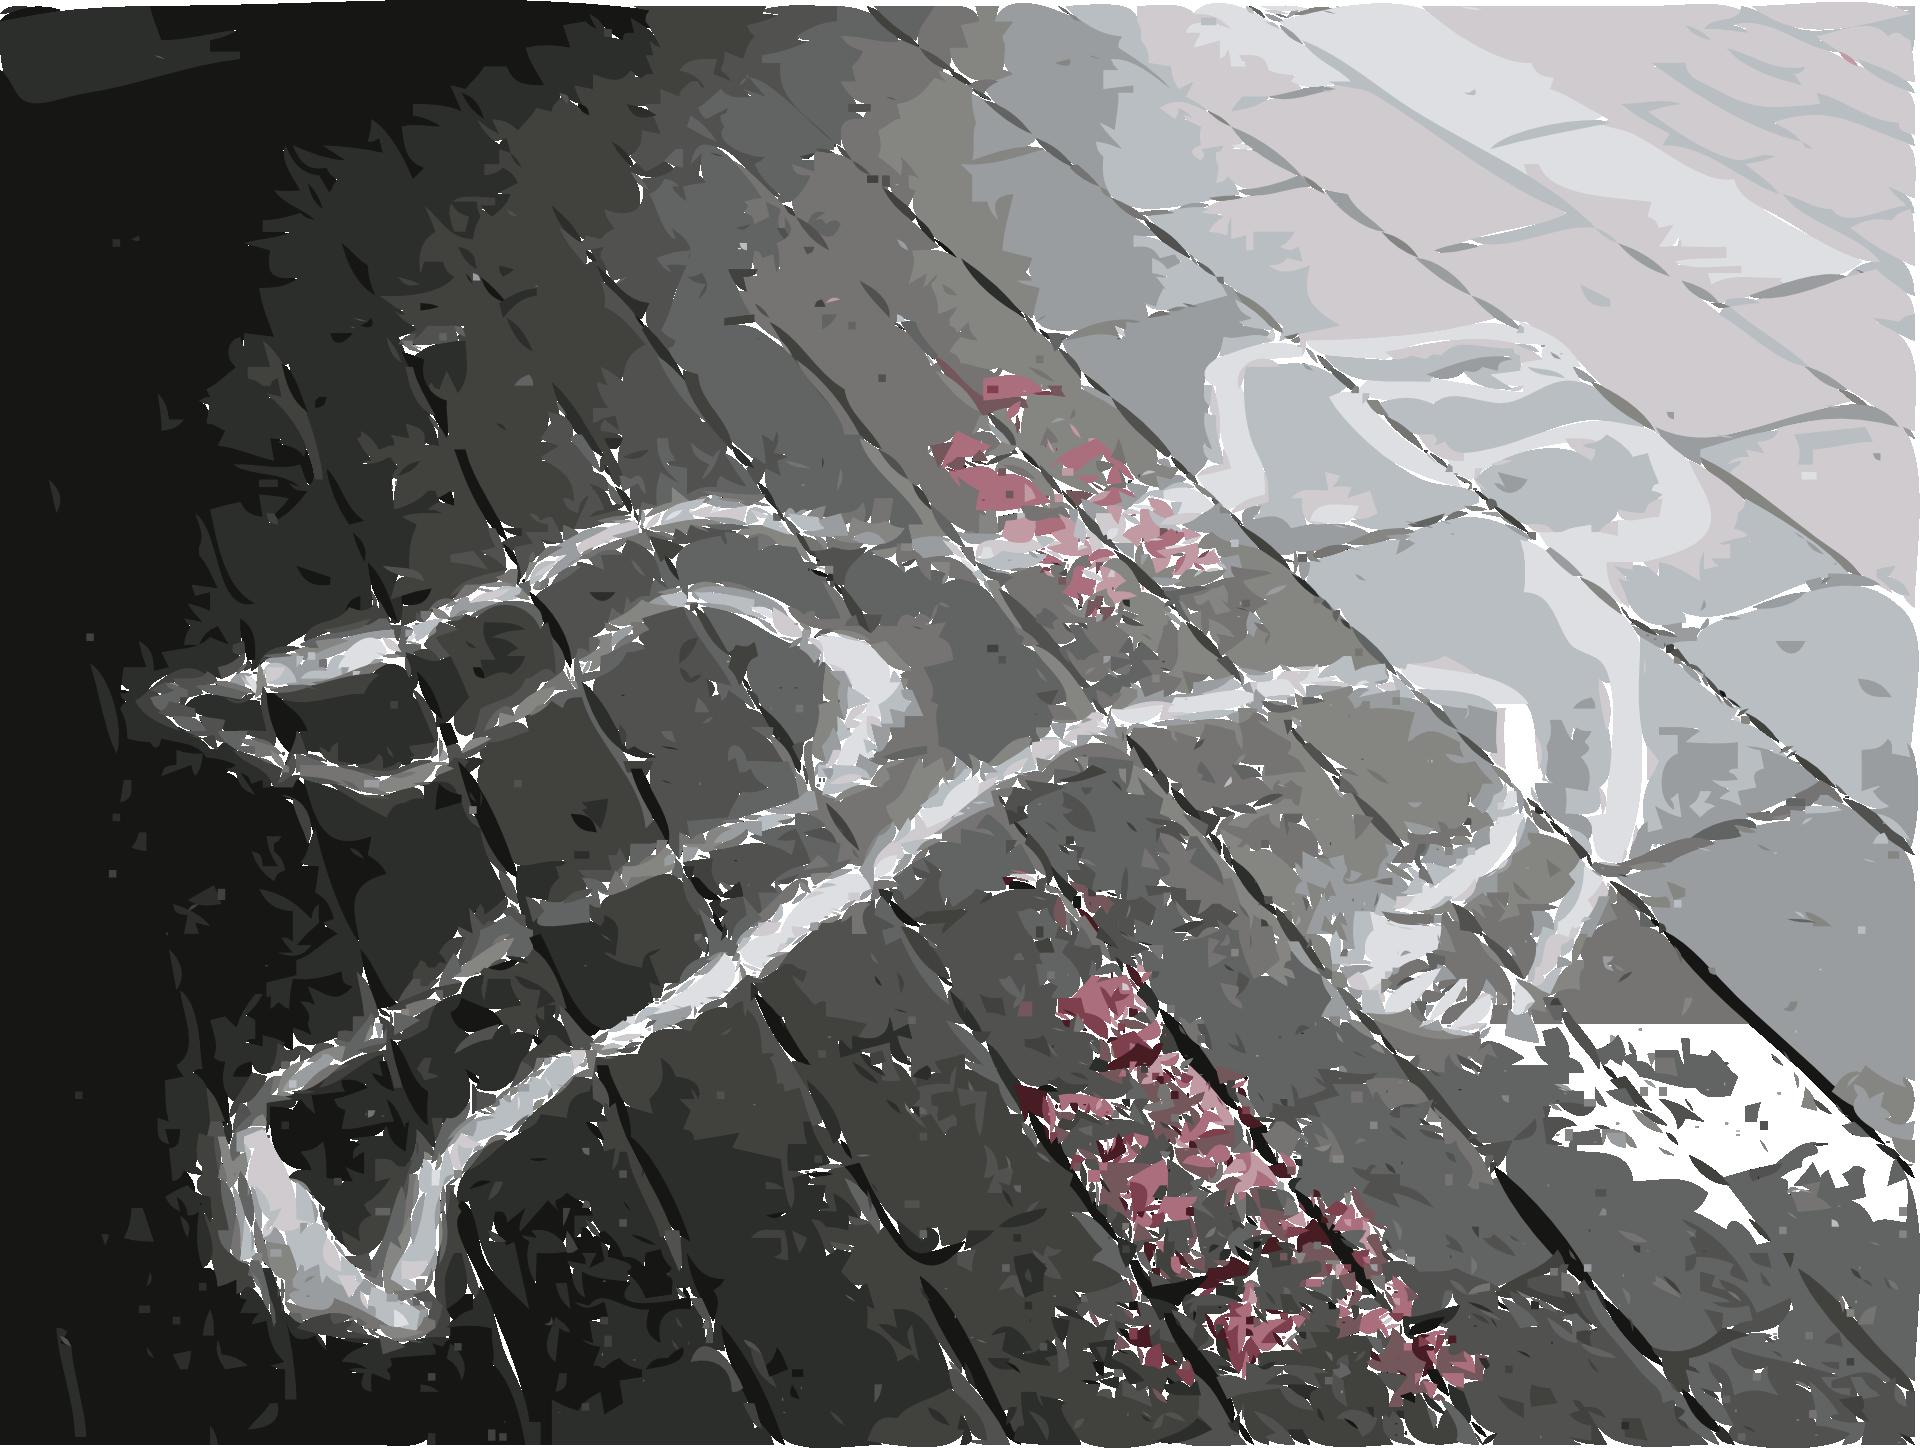 crime-scene-30112.png